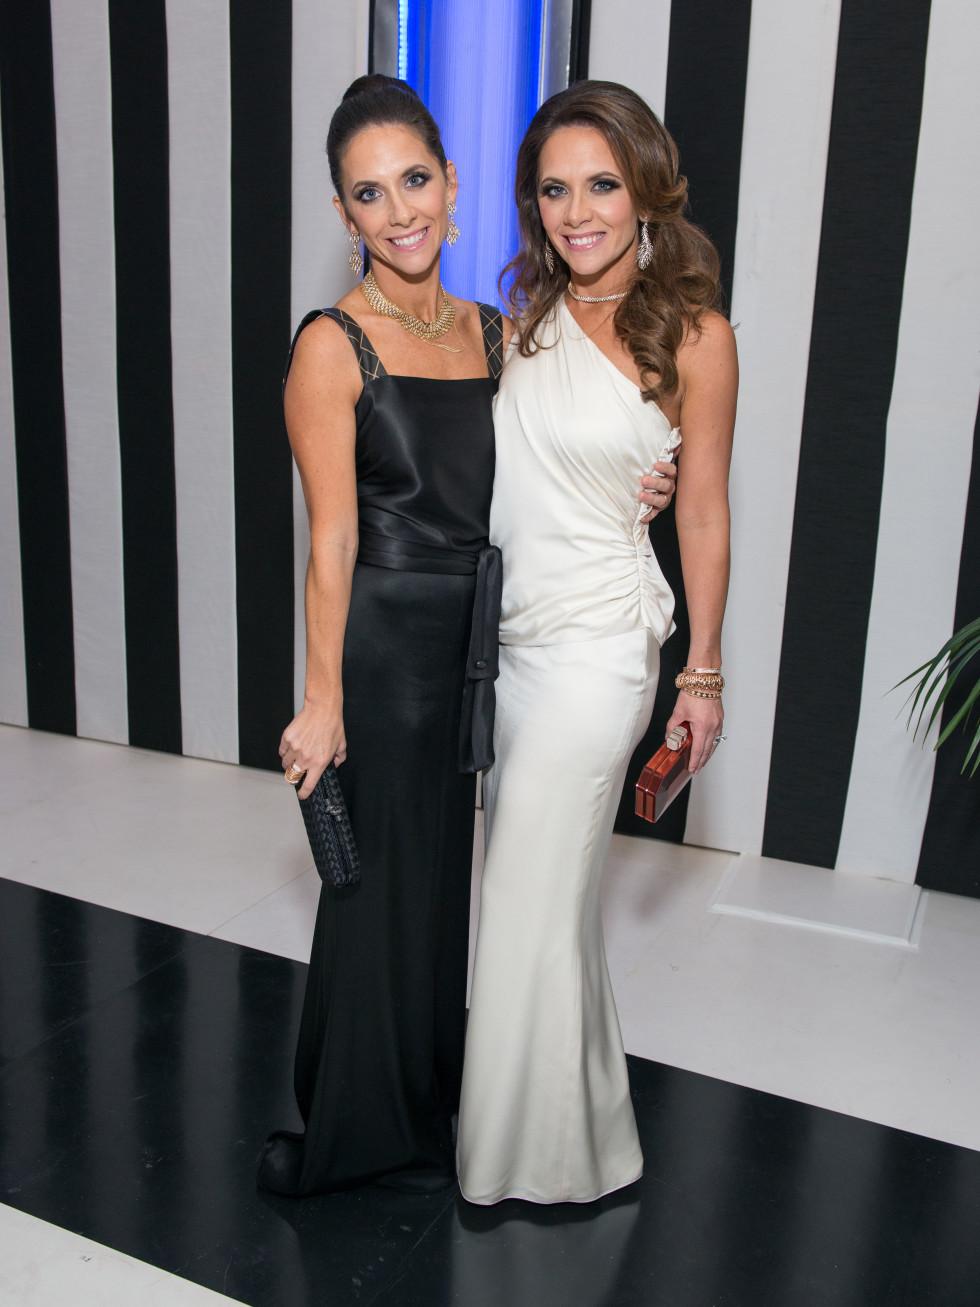 News, Shelby, MFAH gala gowns, Oct. 2015 Hannah McNair, Joanna Marks, both in Chanel